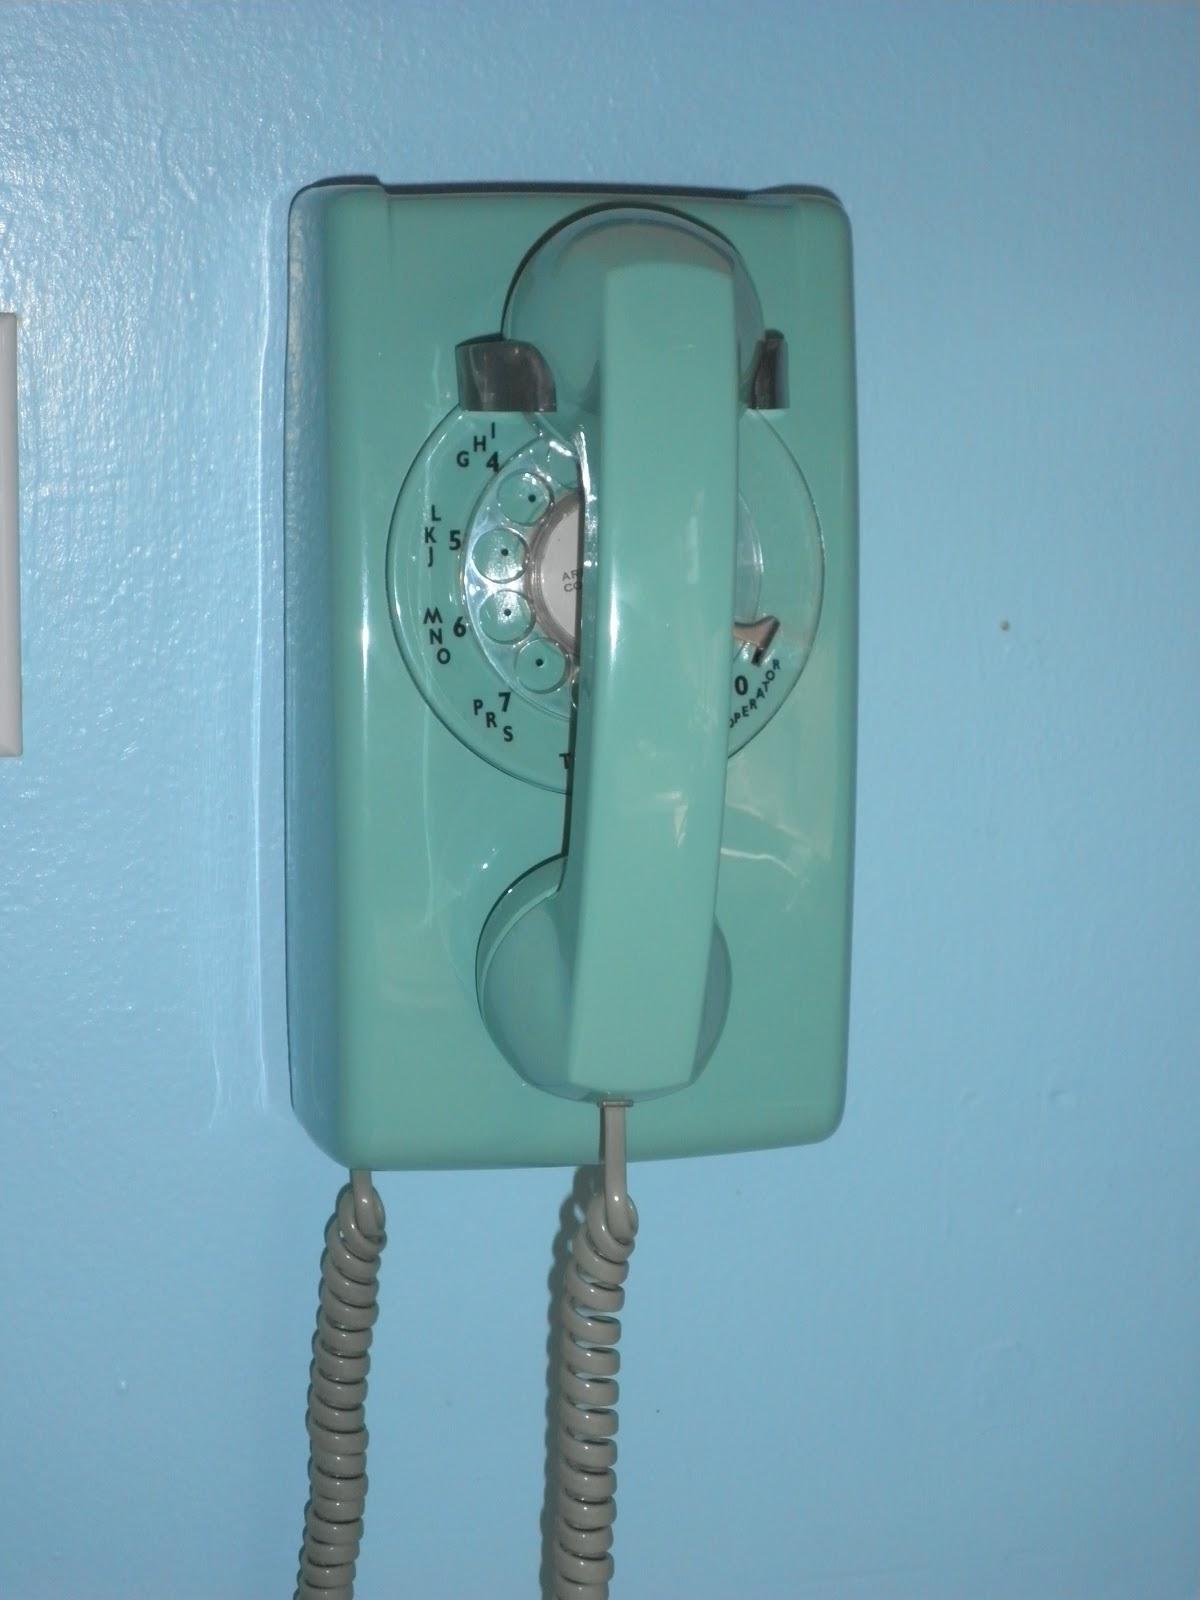 Retro Kitchen Wall Phones